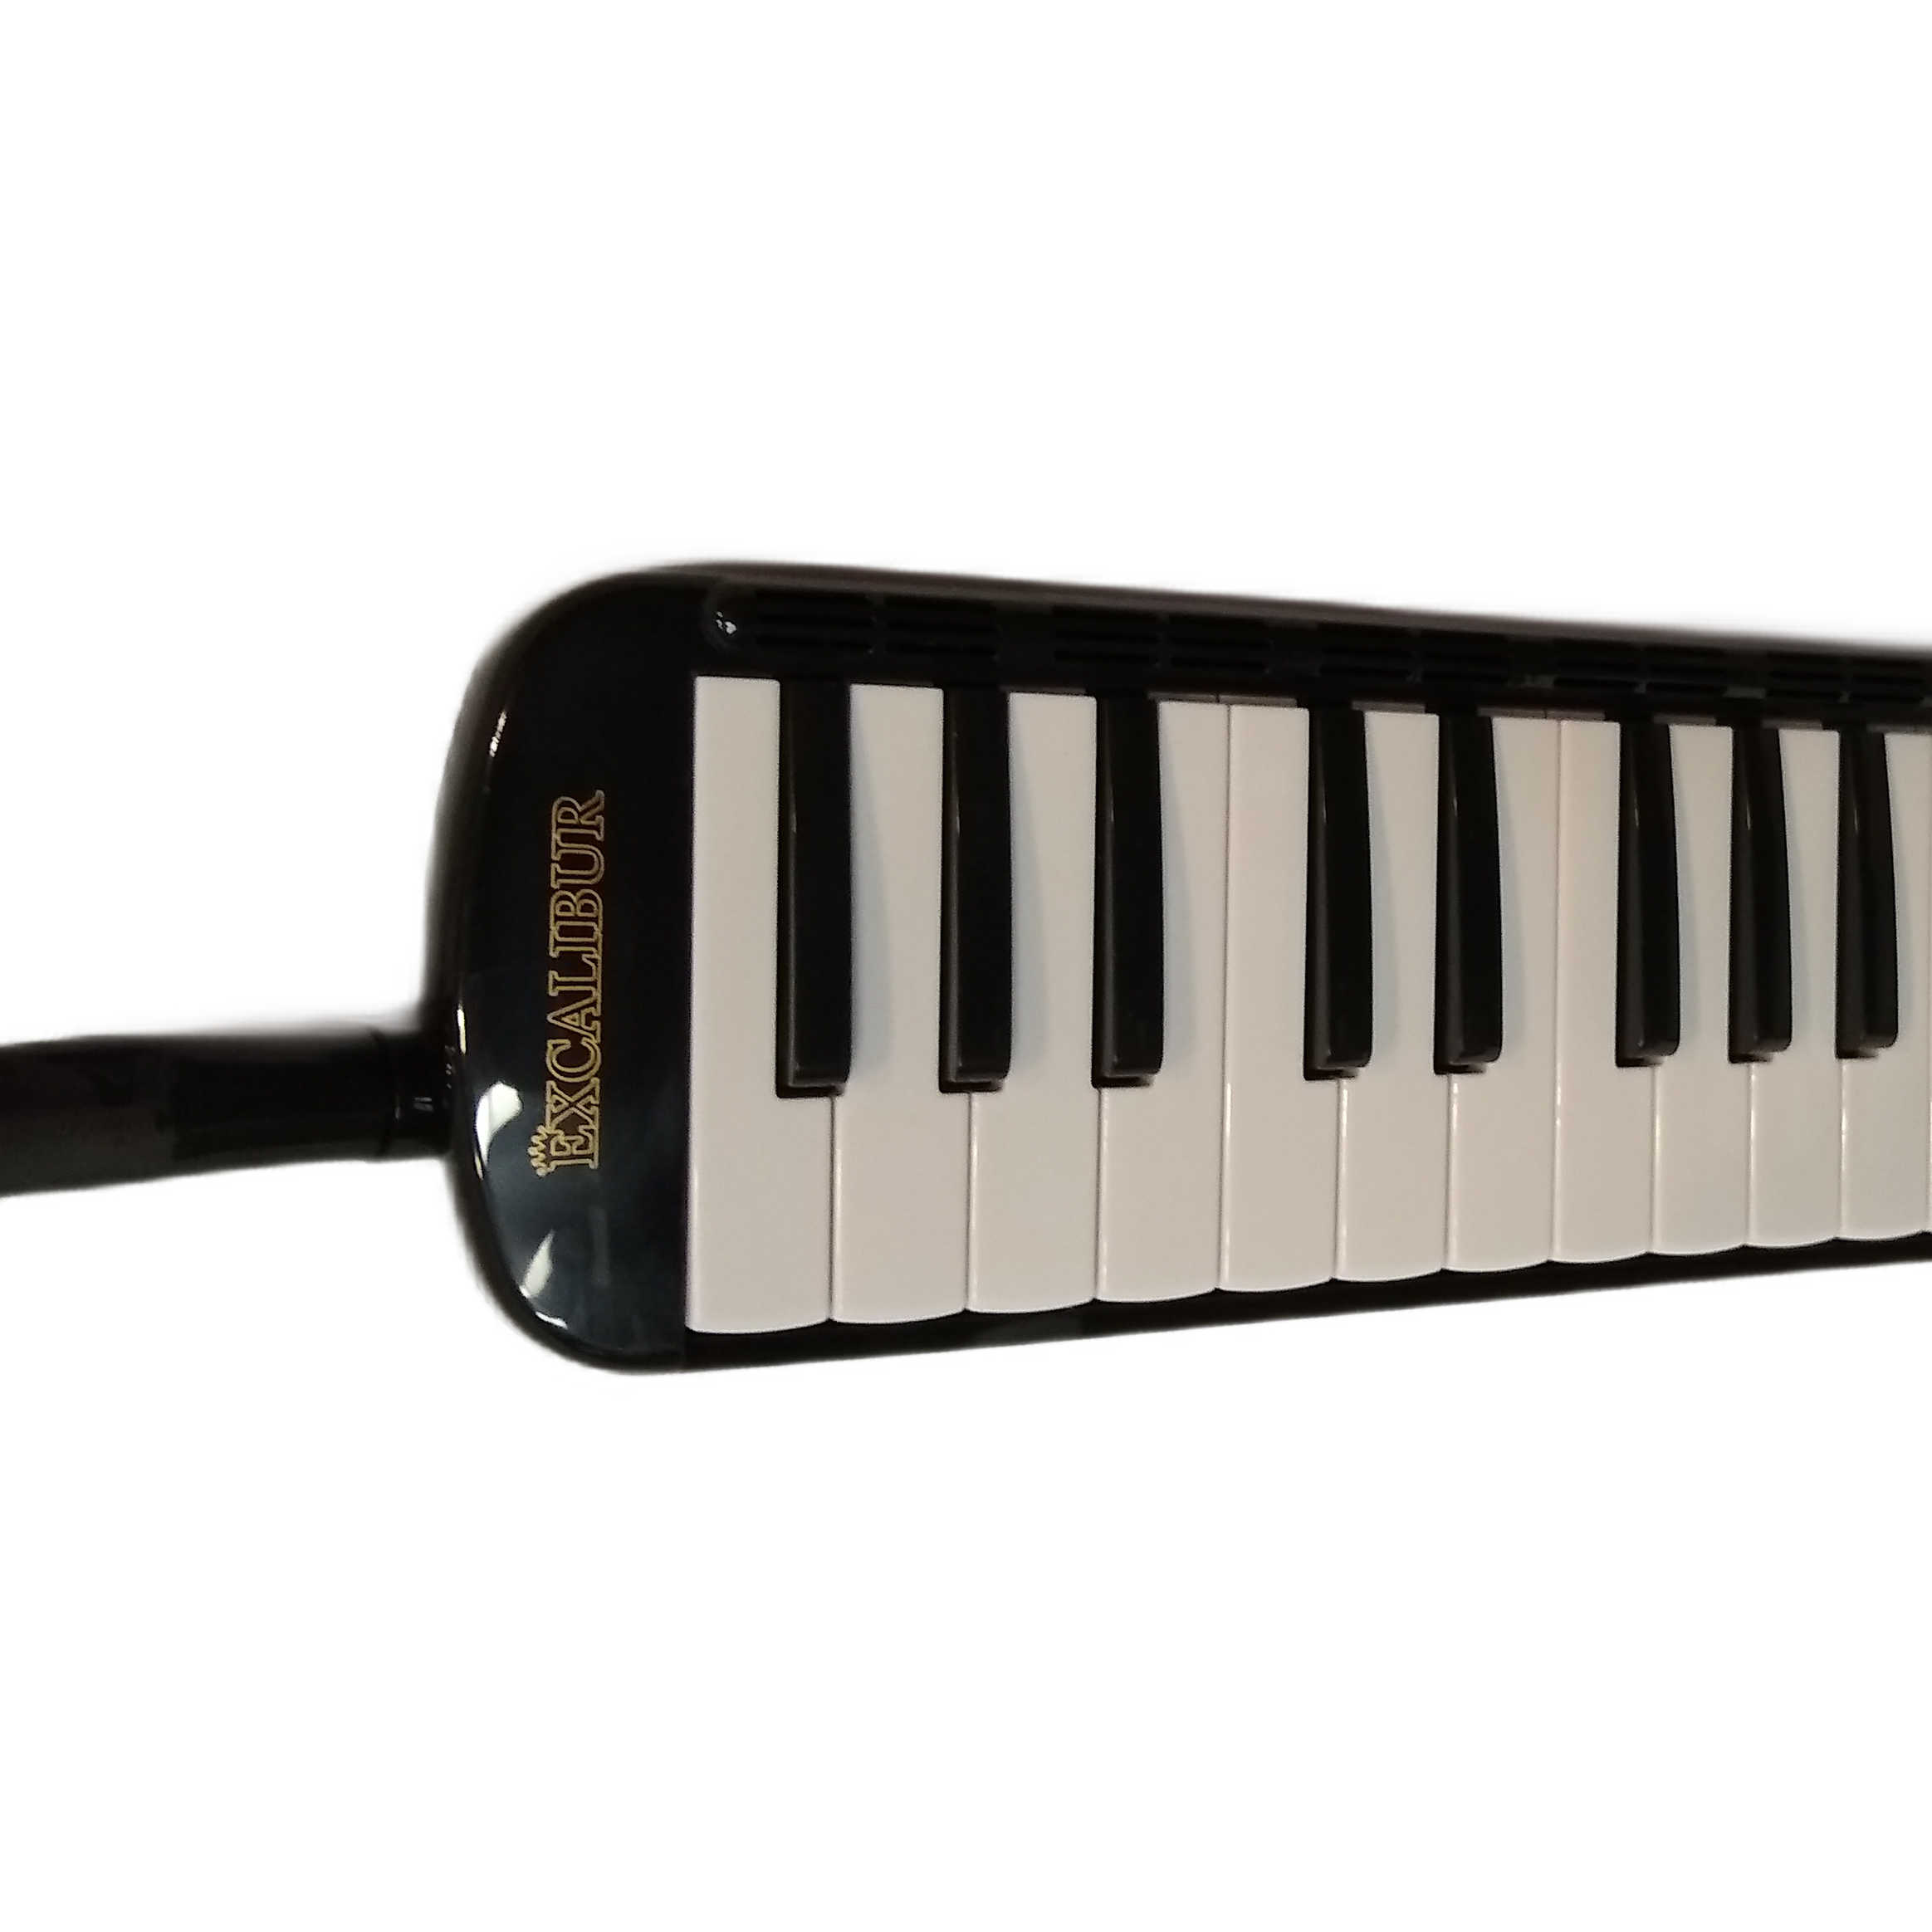 Excalibur 37 Note Transparent Pro Series Black Polish